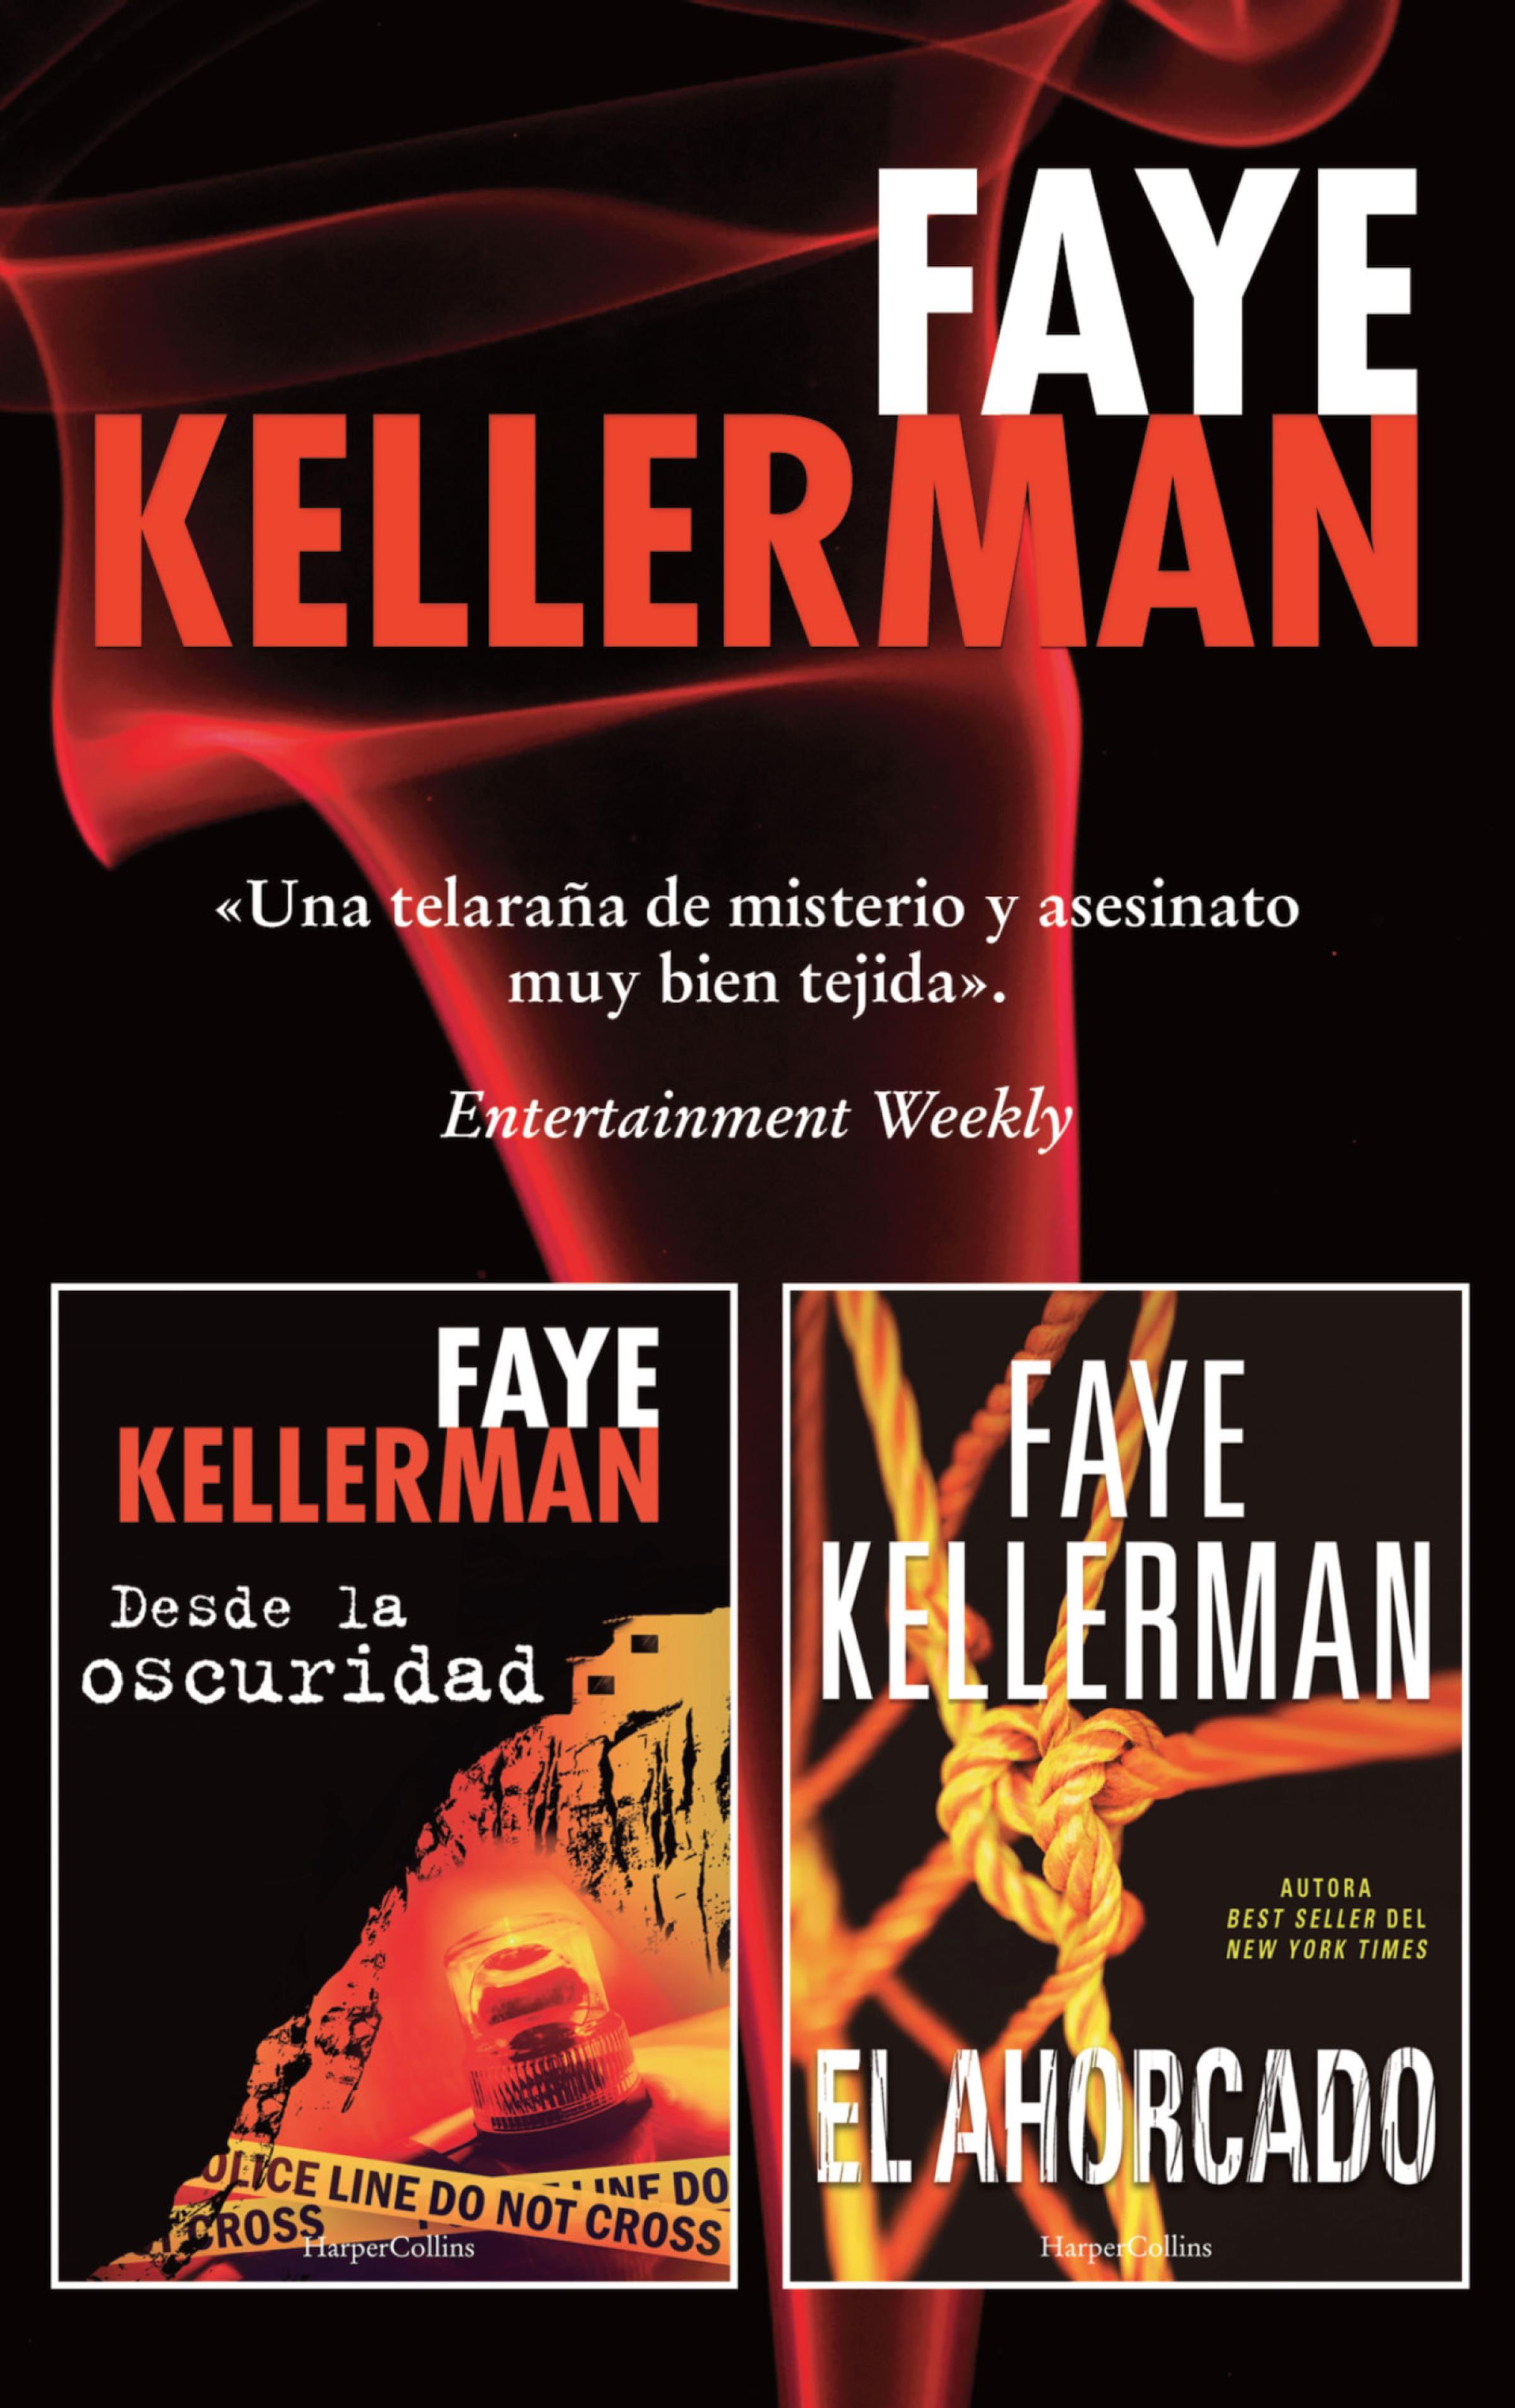 Faye Kellerman Pack Faye Keyerman - Febrero 2018 цена